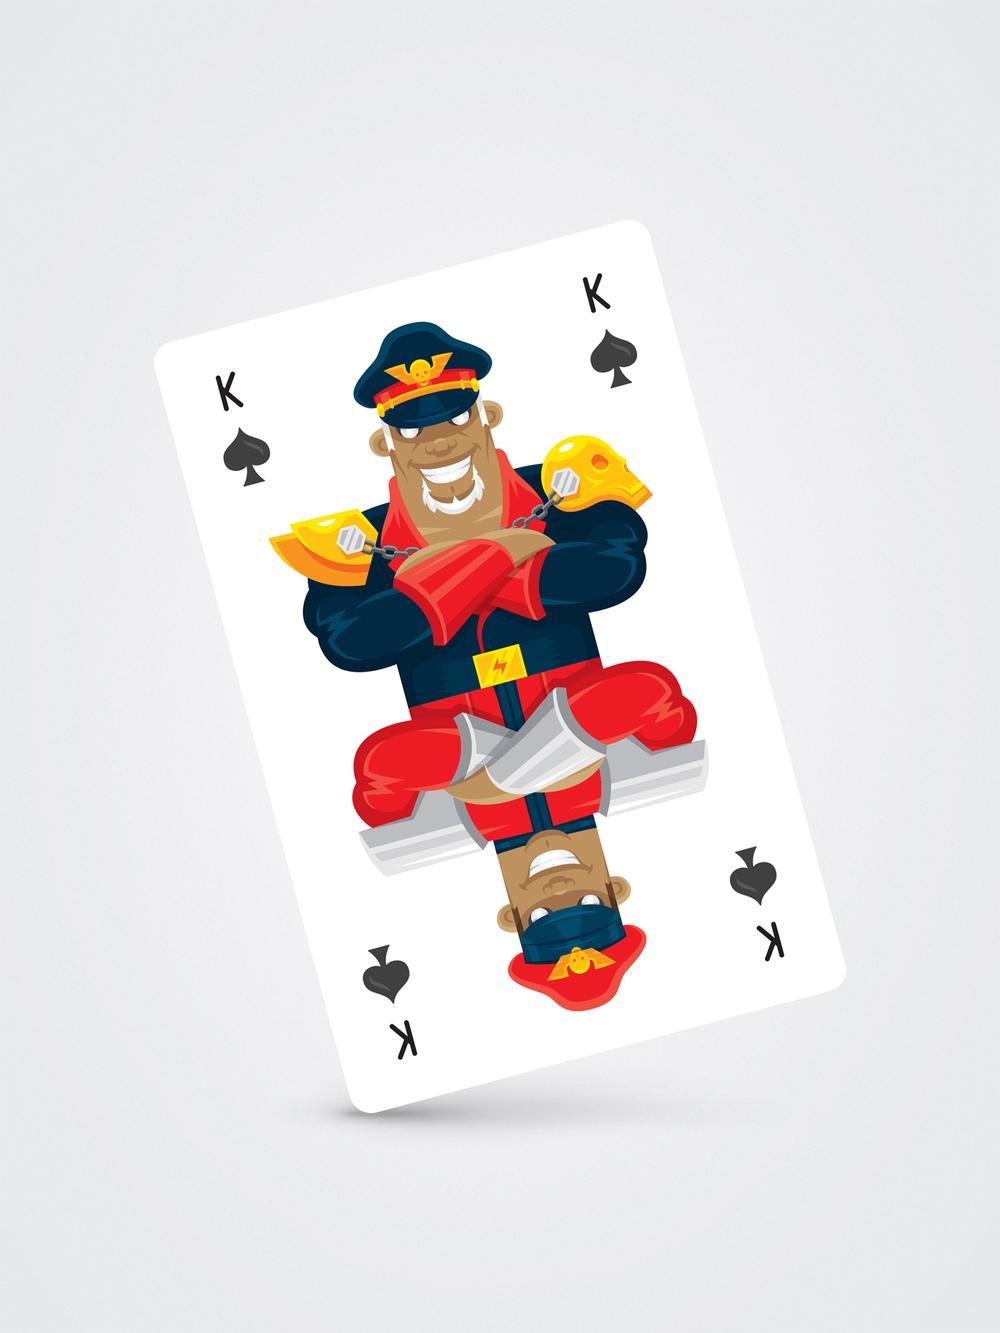 M. Bison – King of SPades